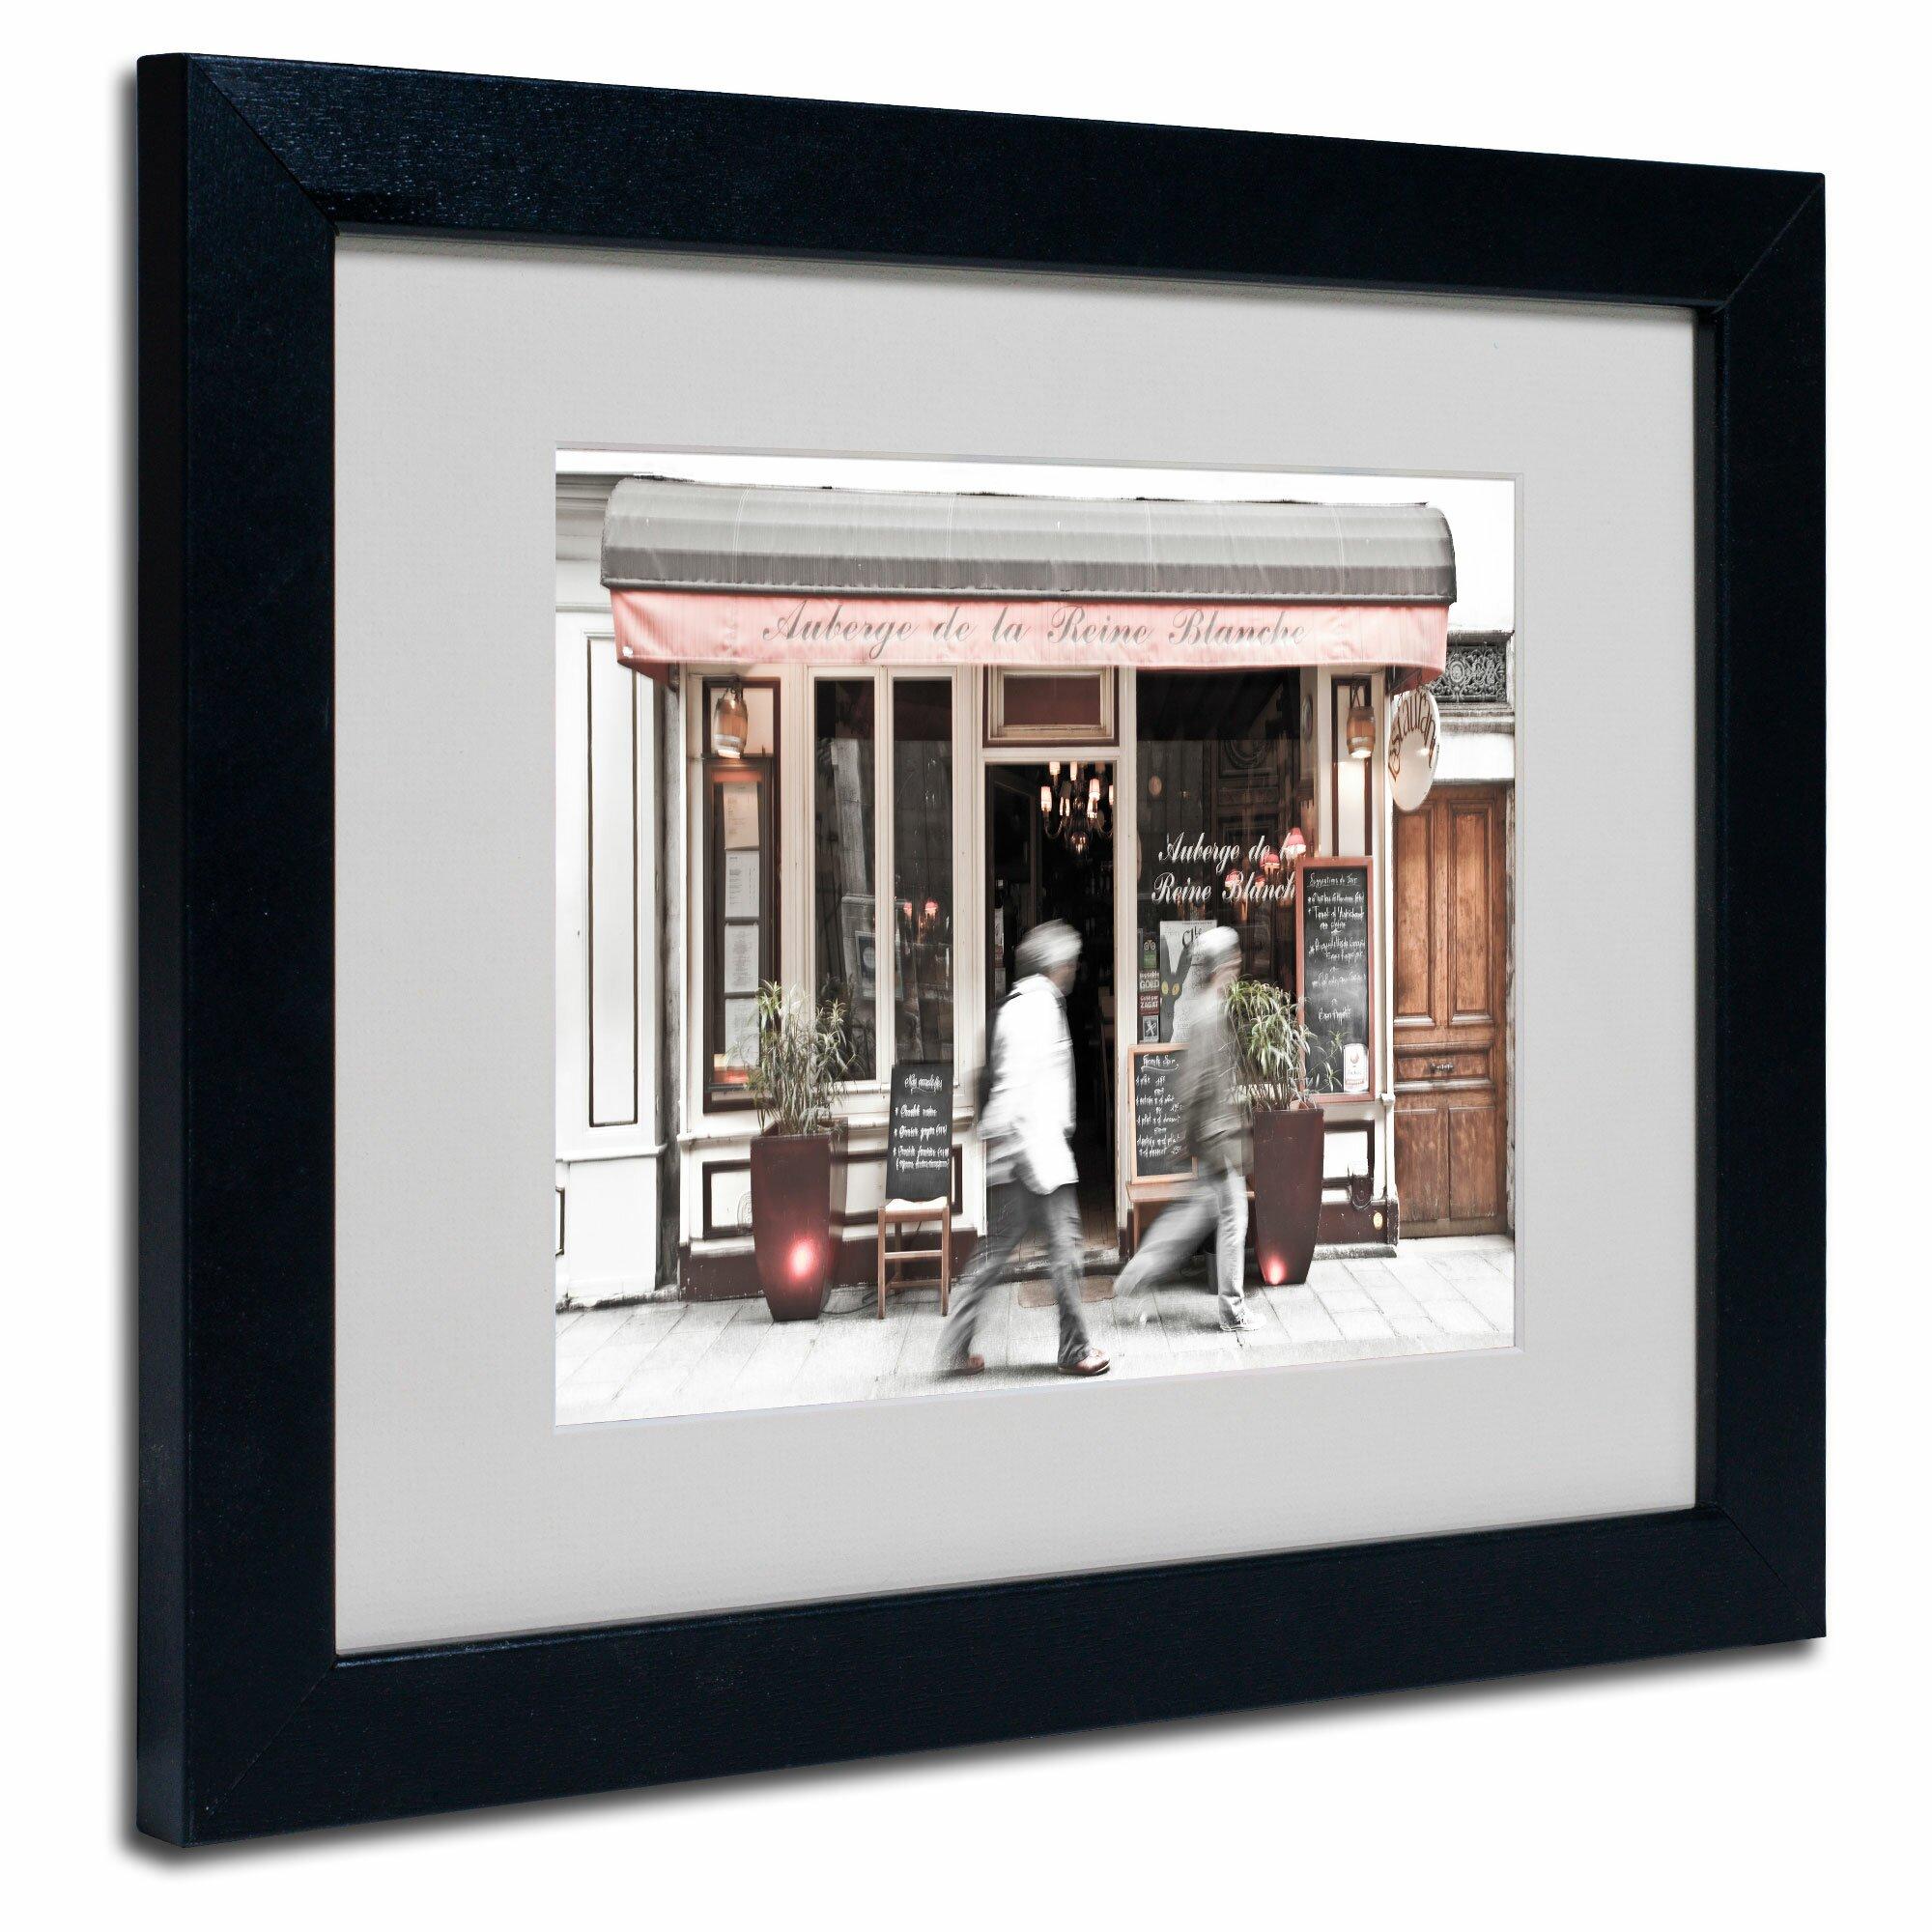 Trademark Art quotParis Parisian Bakeryquot by Yale Gurney  : Trademark Fine Art Paris Parisian Bakery by Yale Gurney Framed Photographic Print from www.wayfair.com size 2000 x 2000 jpeg 505kB